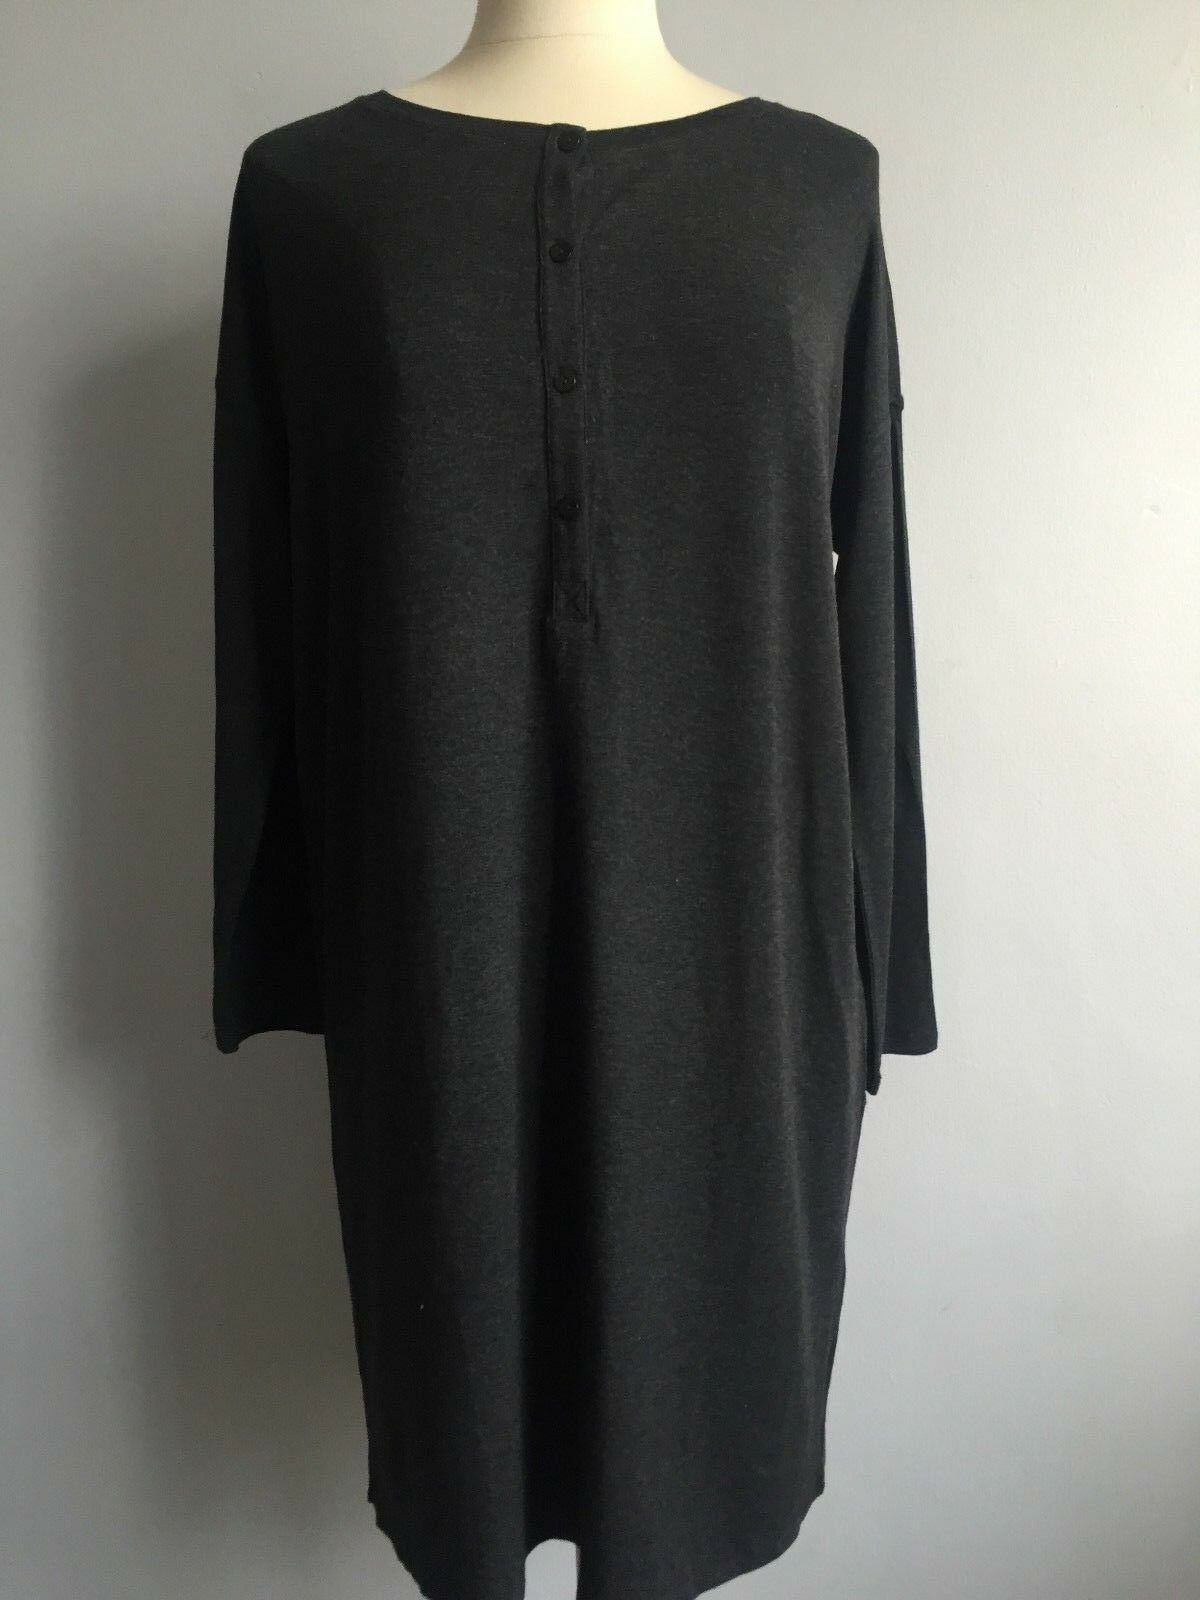 NWT  Eileen Fisher Charcoal Viscose Jersey Ballet Neck Shift Dress Tunic S M